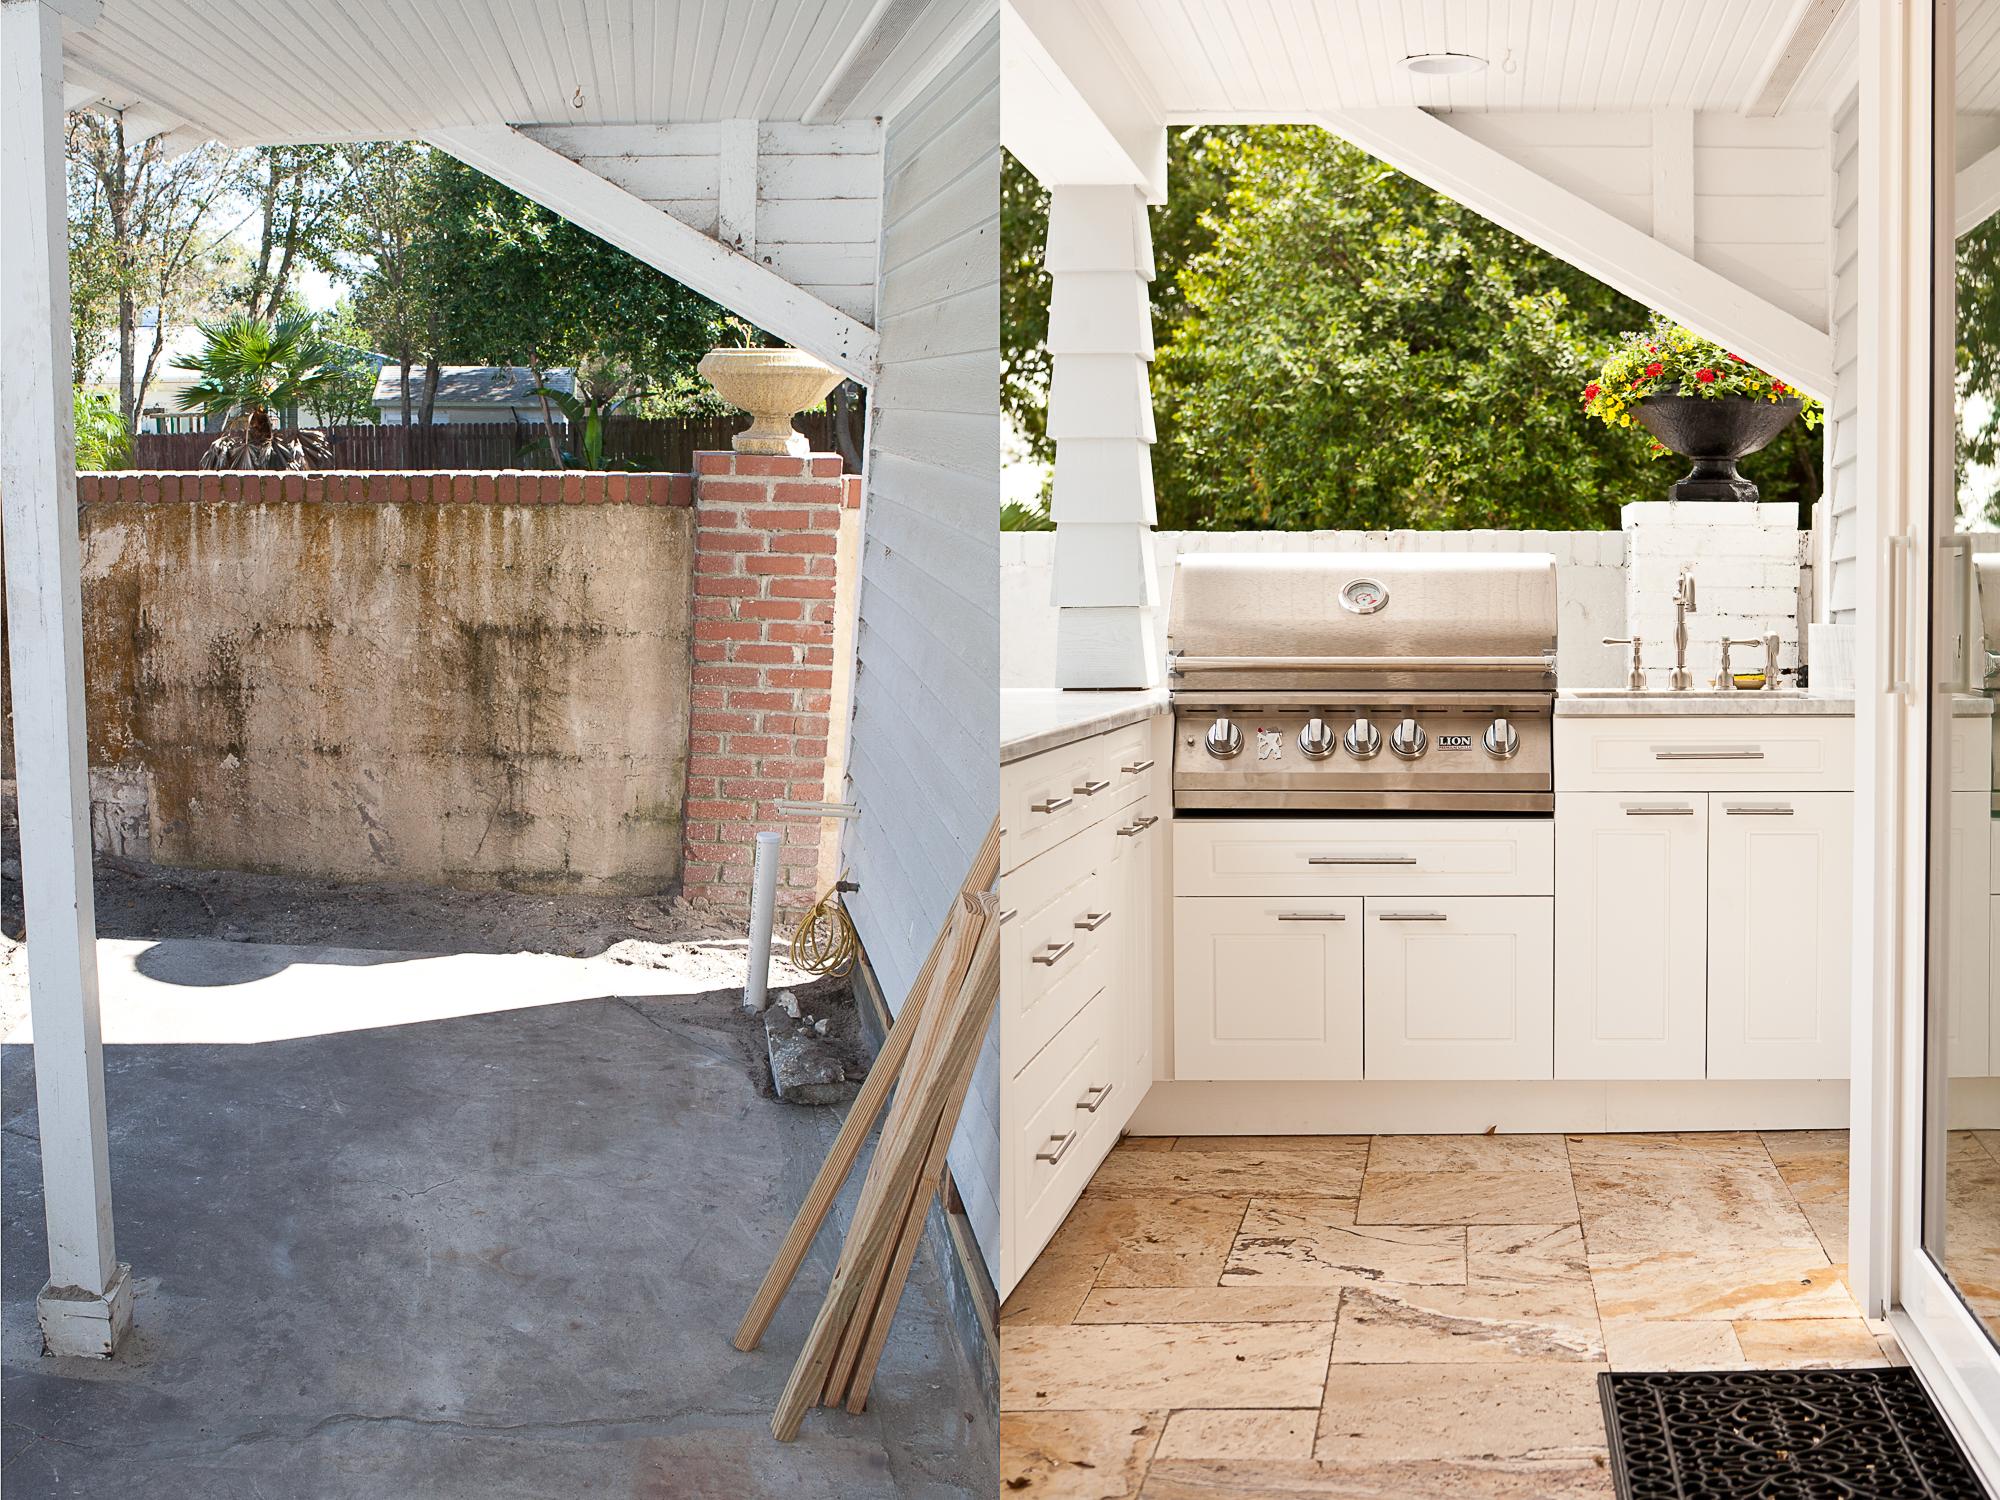 Clearwater outdoor kitchen